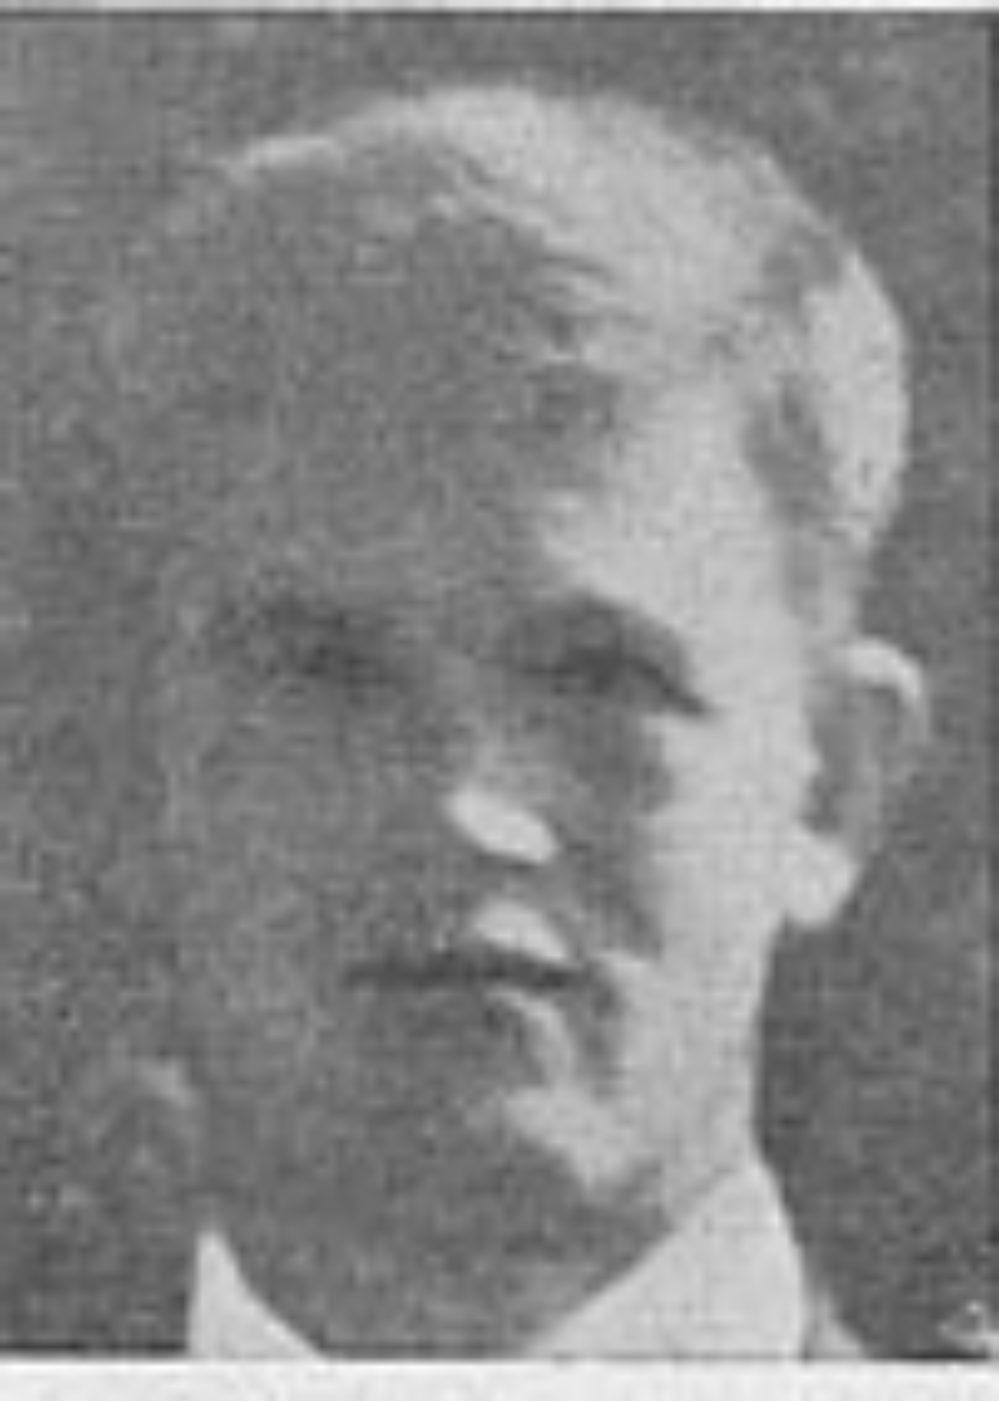 Einar Kristian Gjersengen